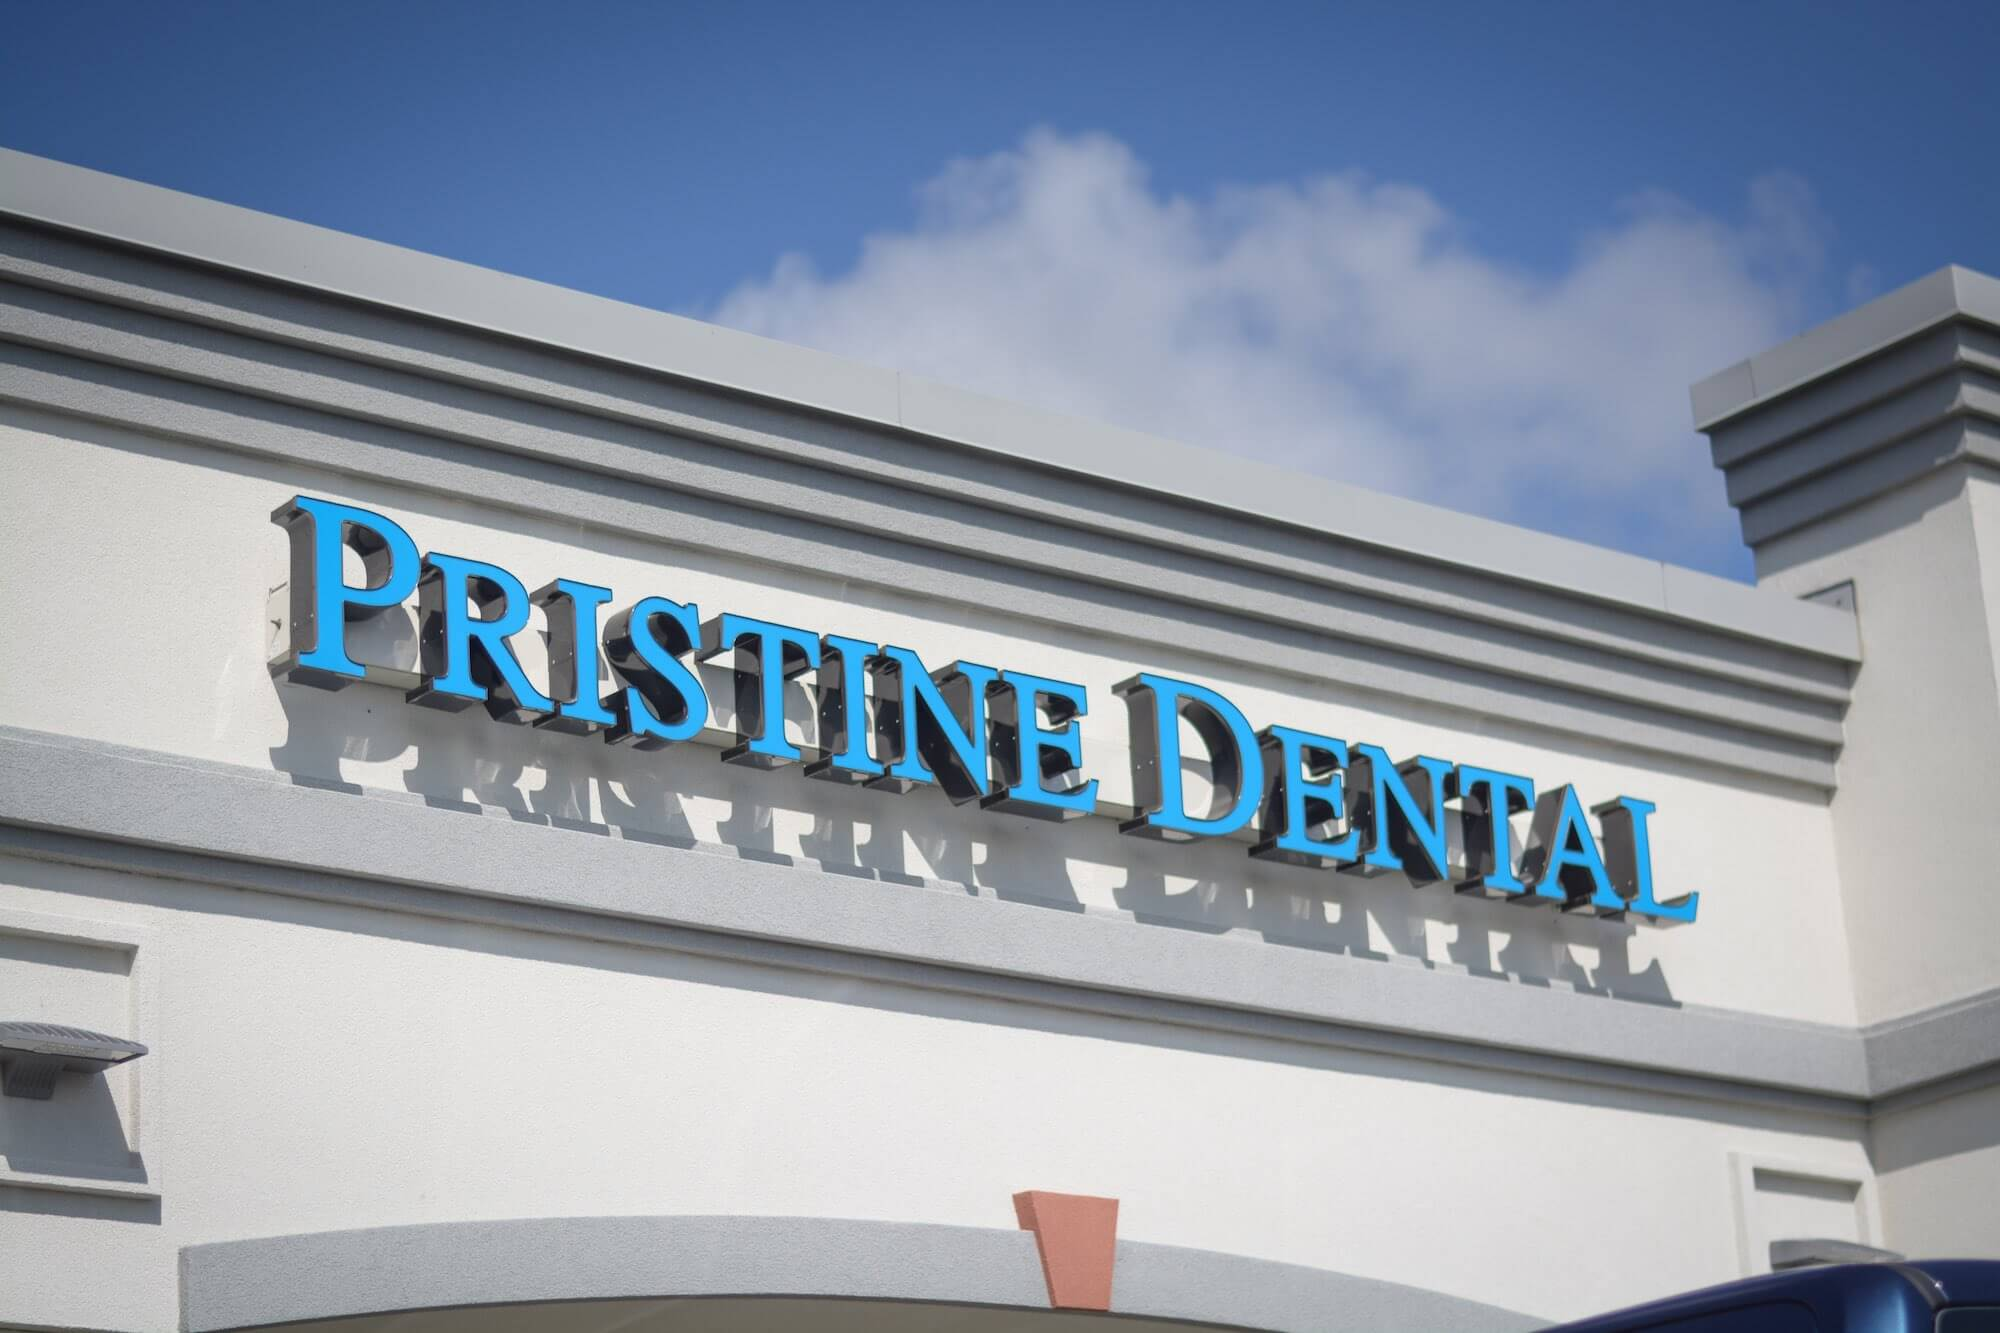 Pristine Dental Exterior Signage